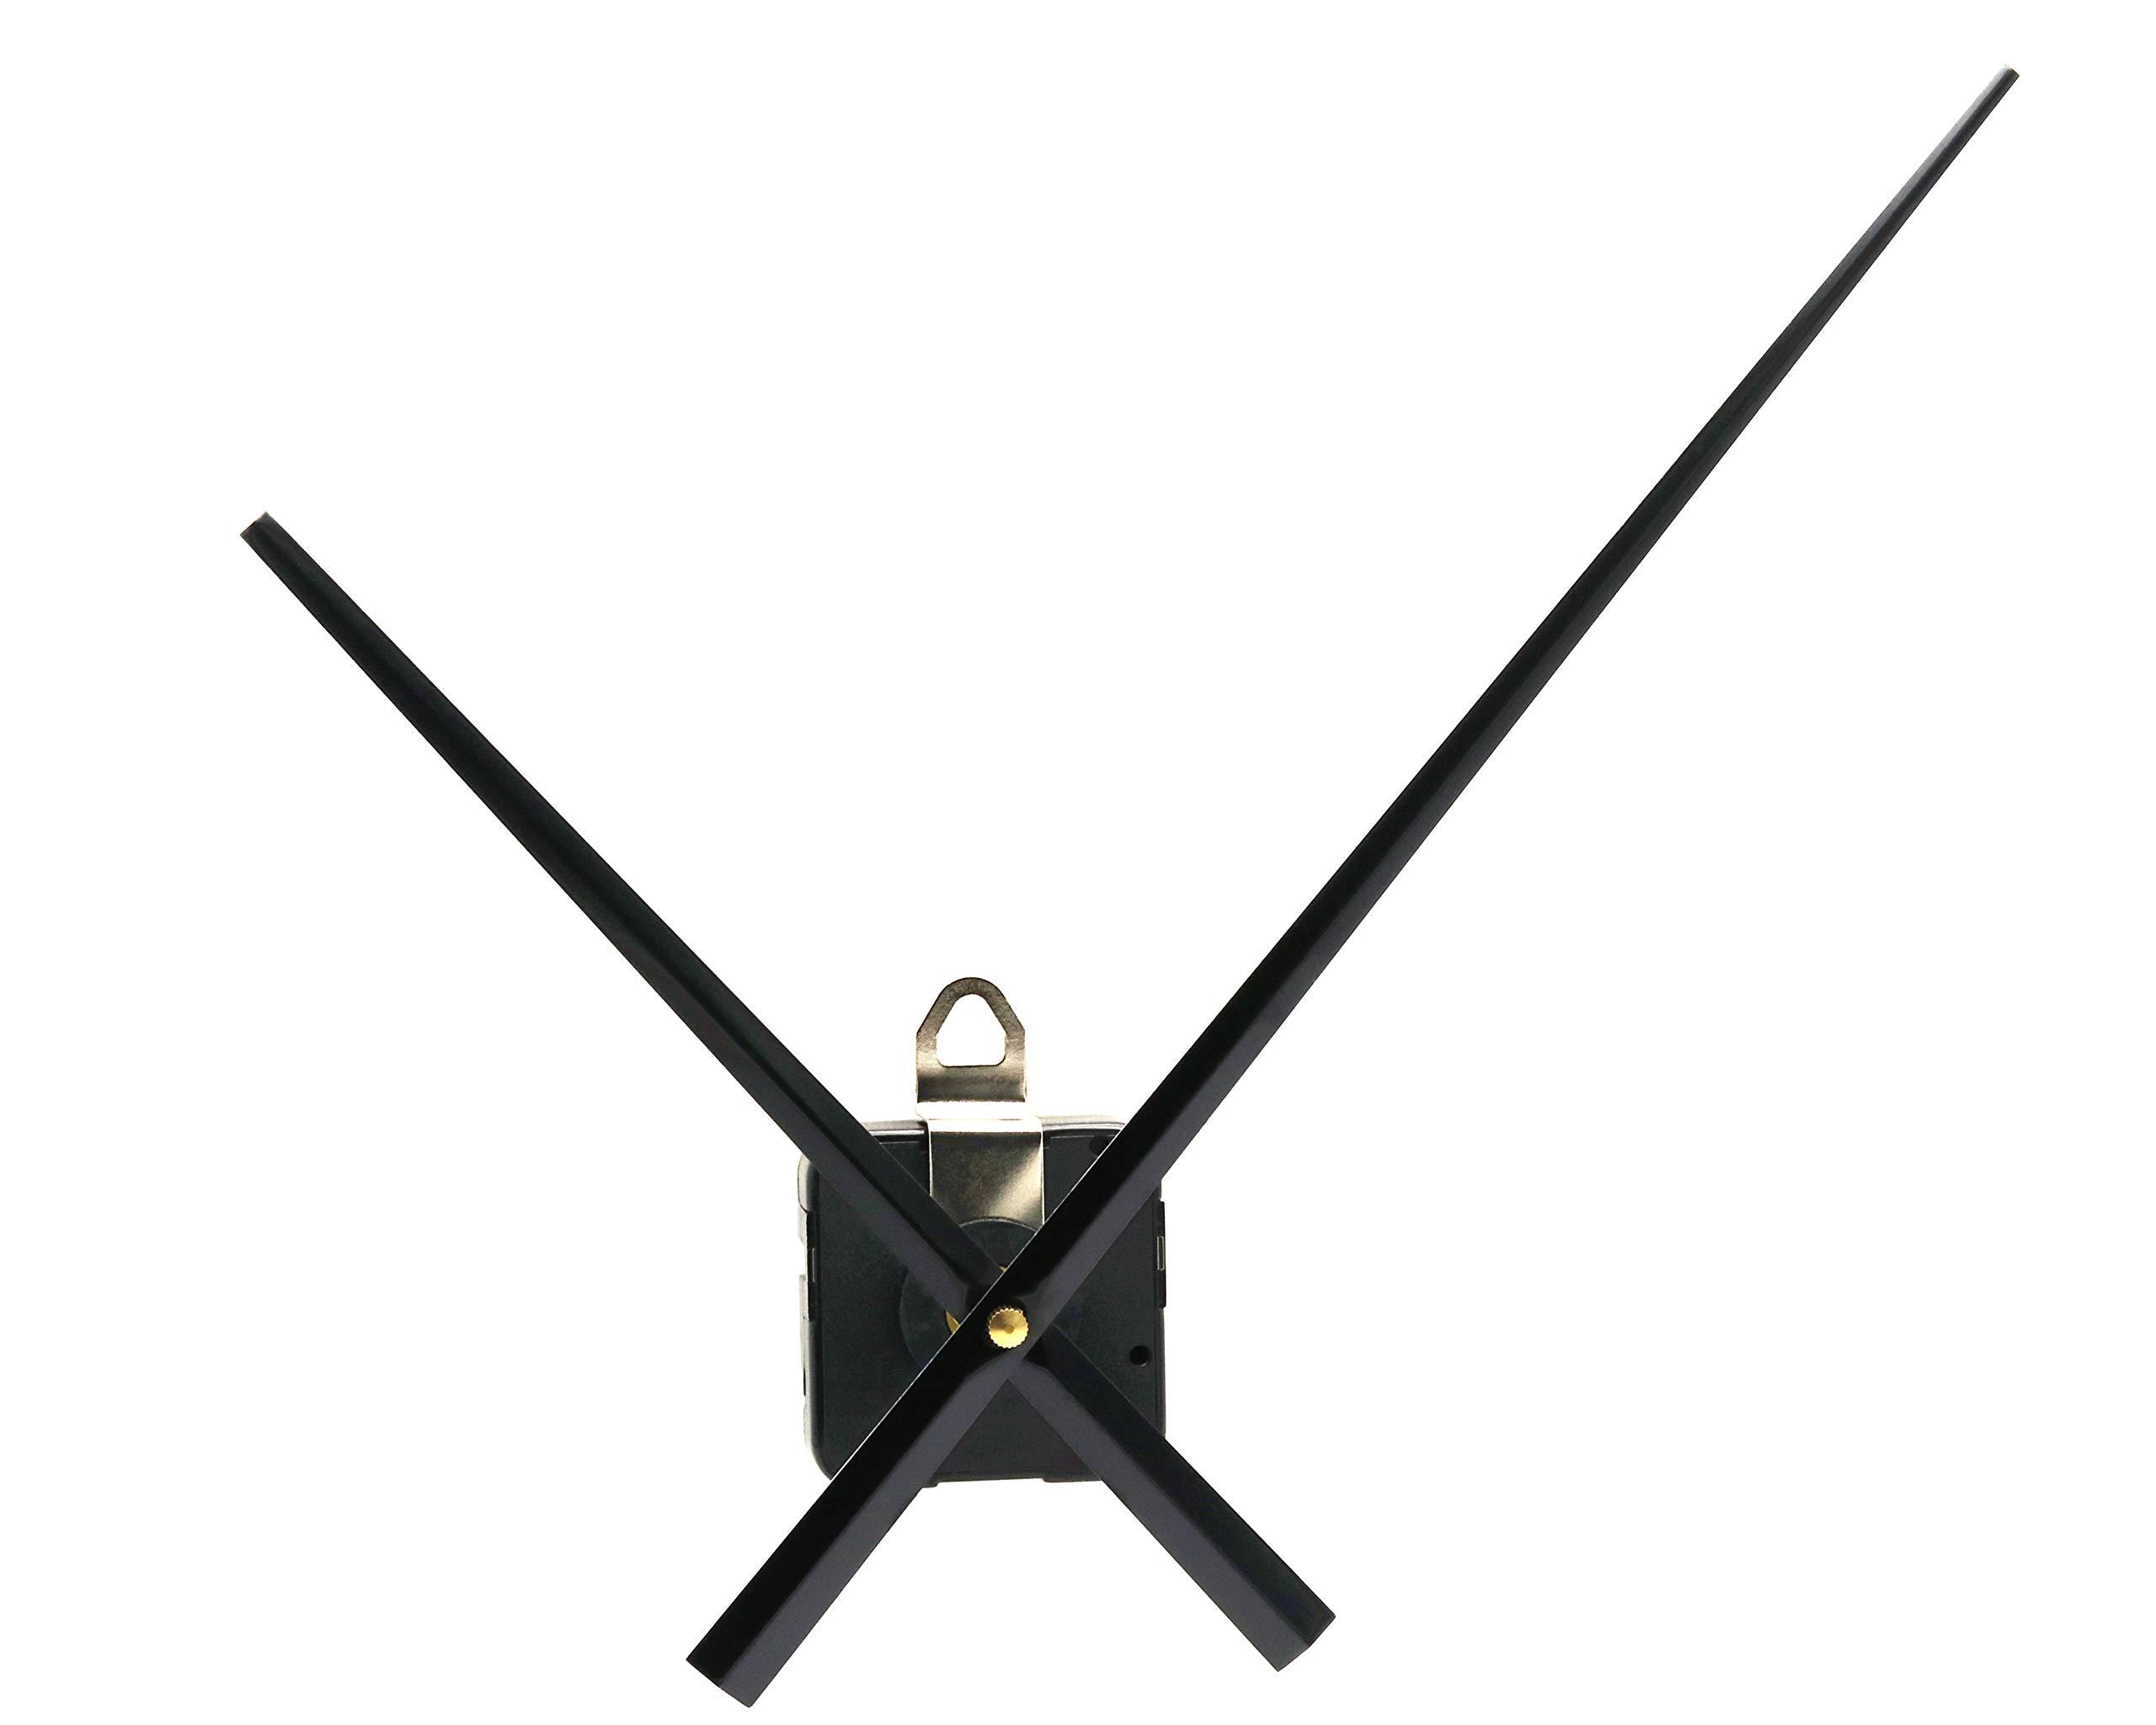 Youngtown 12888 High Torque Long Shaft Clock Movement Mechanism with 9.6 Inch Long Spade Hands.